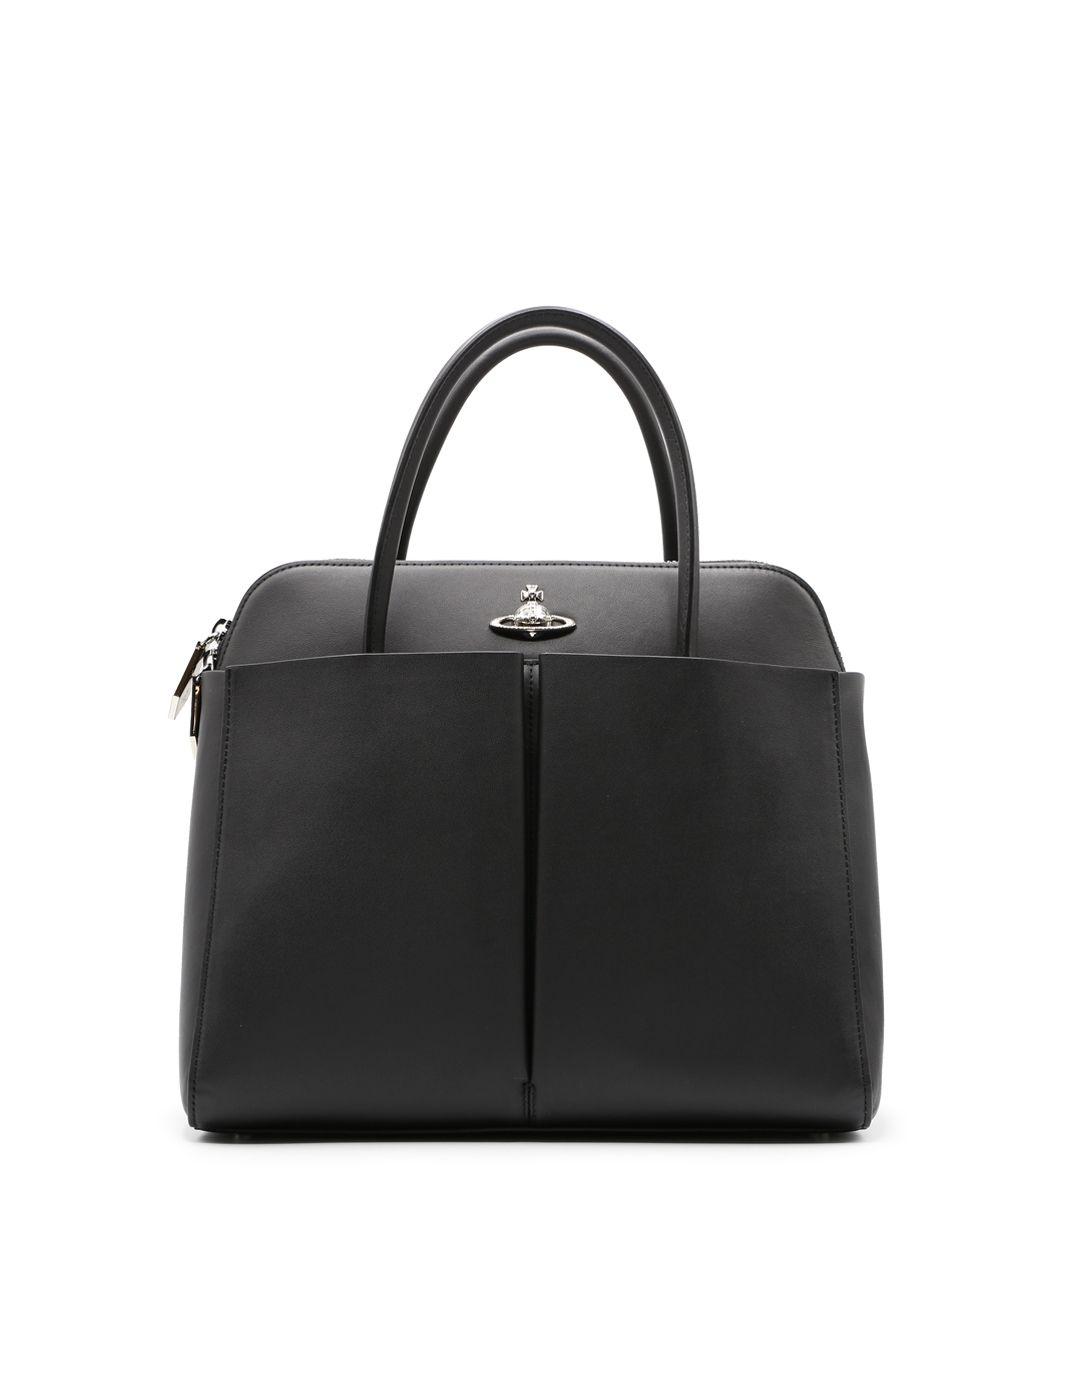 Vivienne Westwood Black Leather Handbag